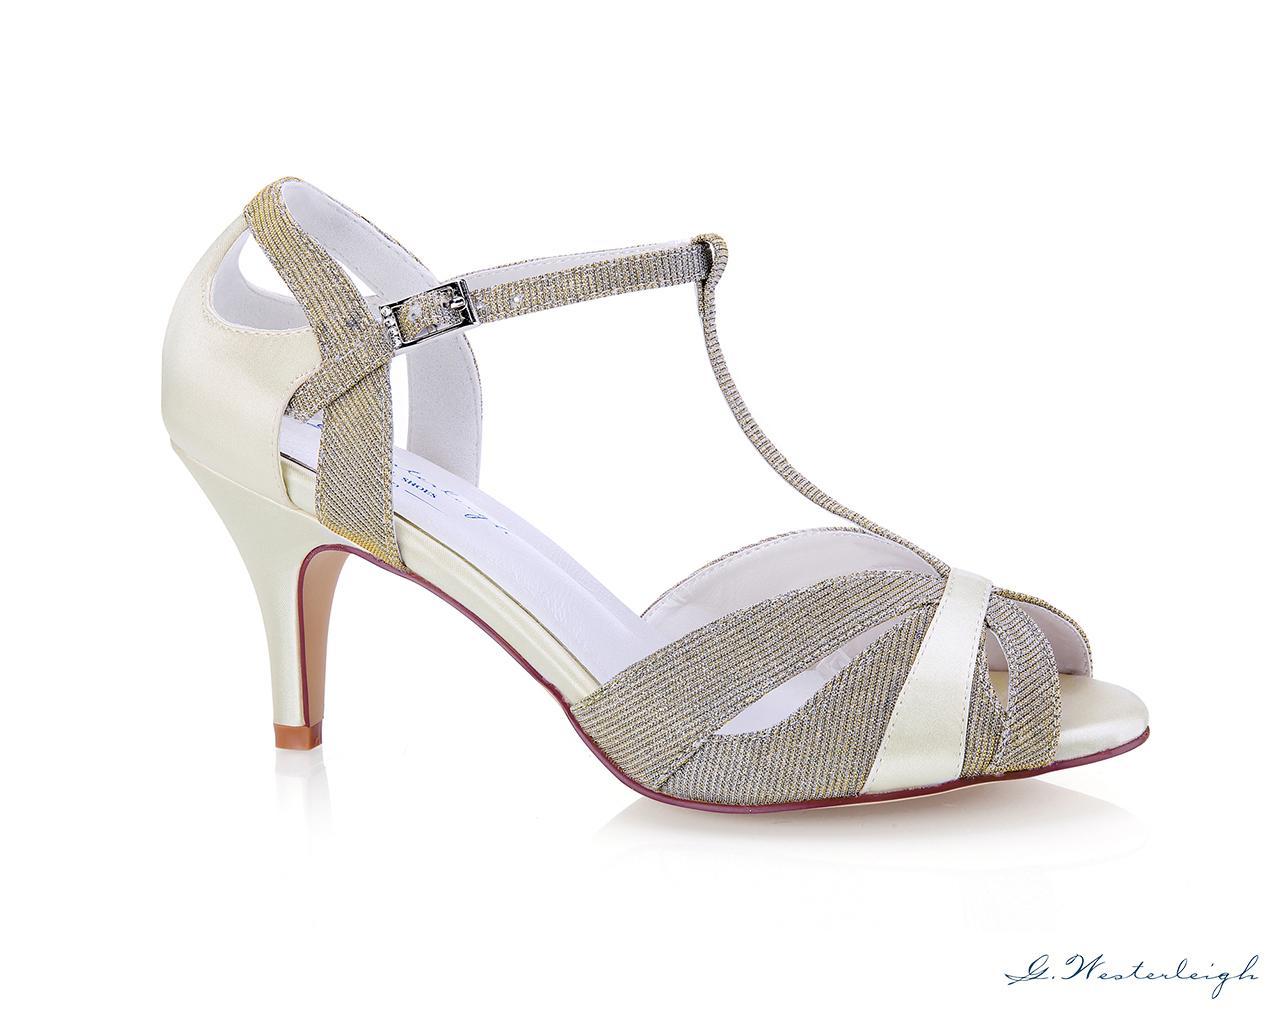 Svadobné topánky Corinne 2 - Obrázok č. 1